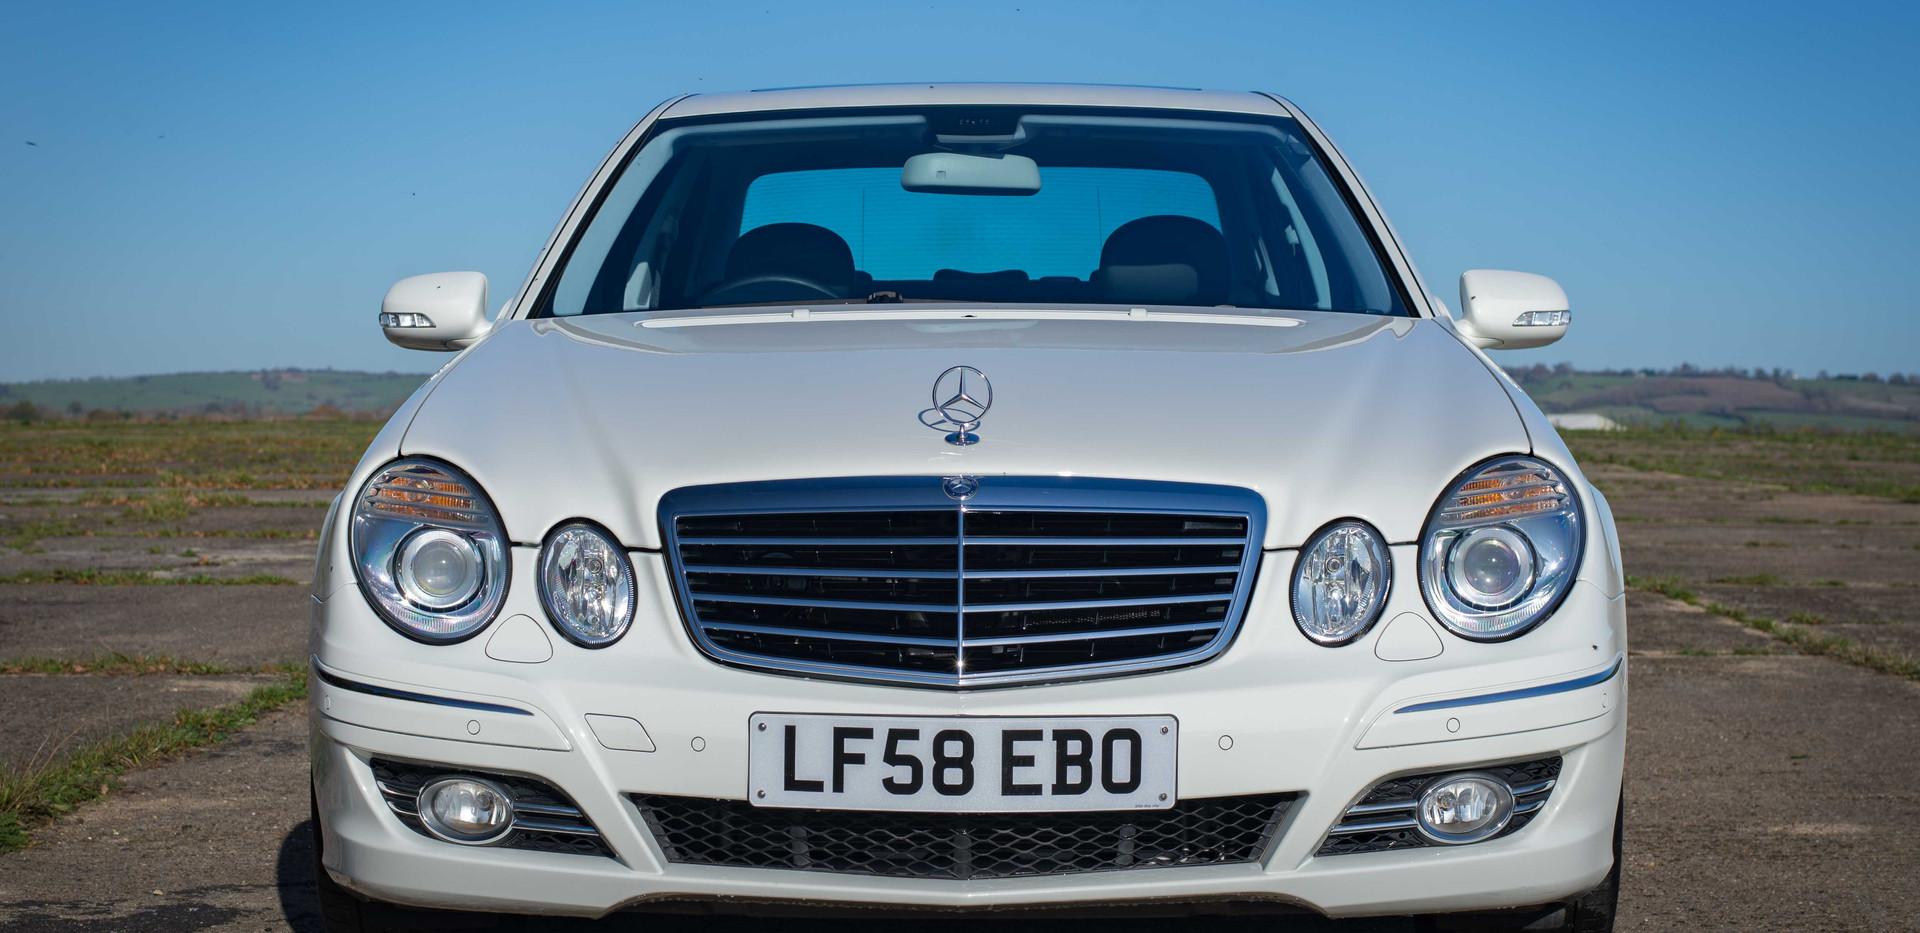 Mercedes E350 For Sale UK London  (3 of